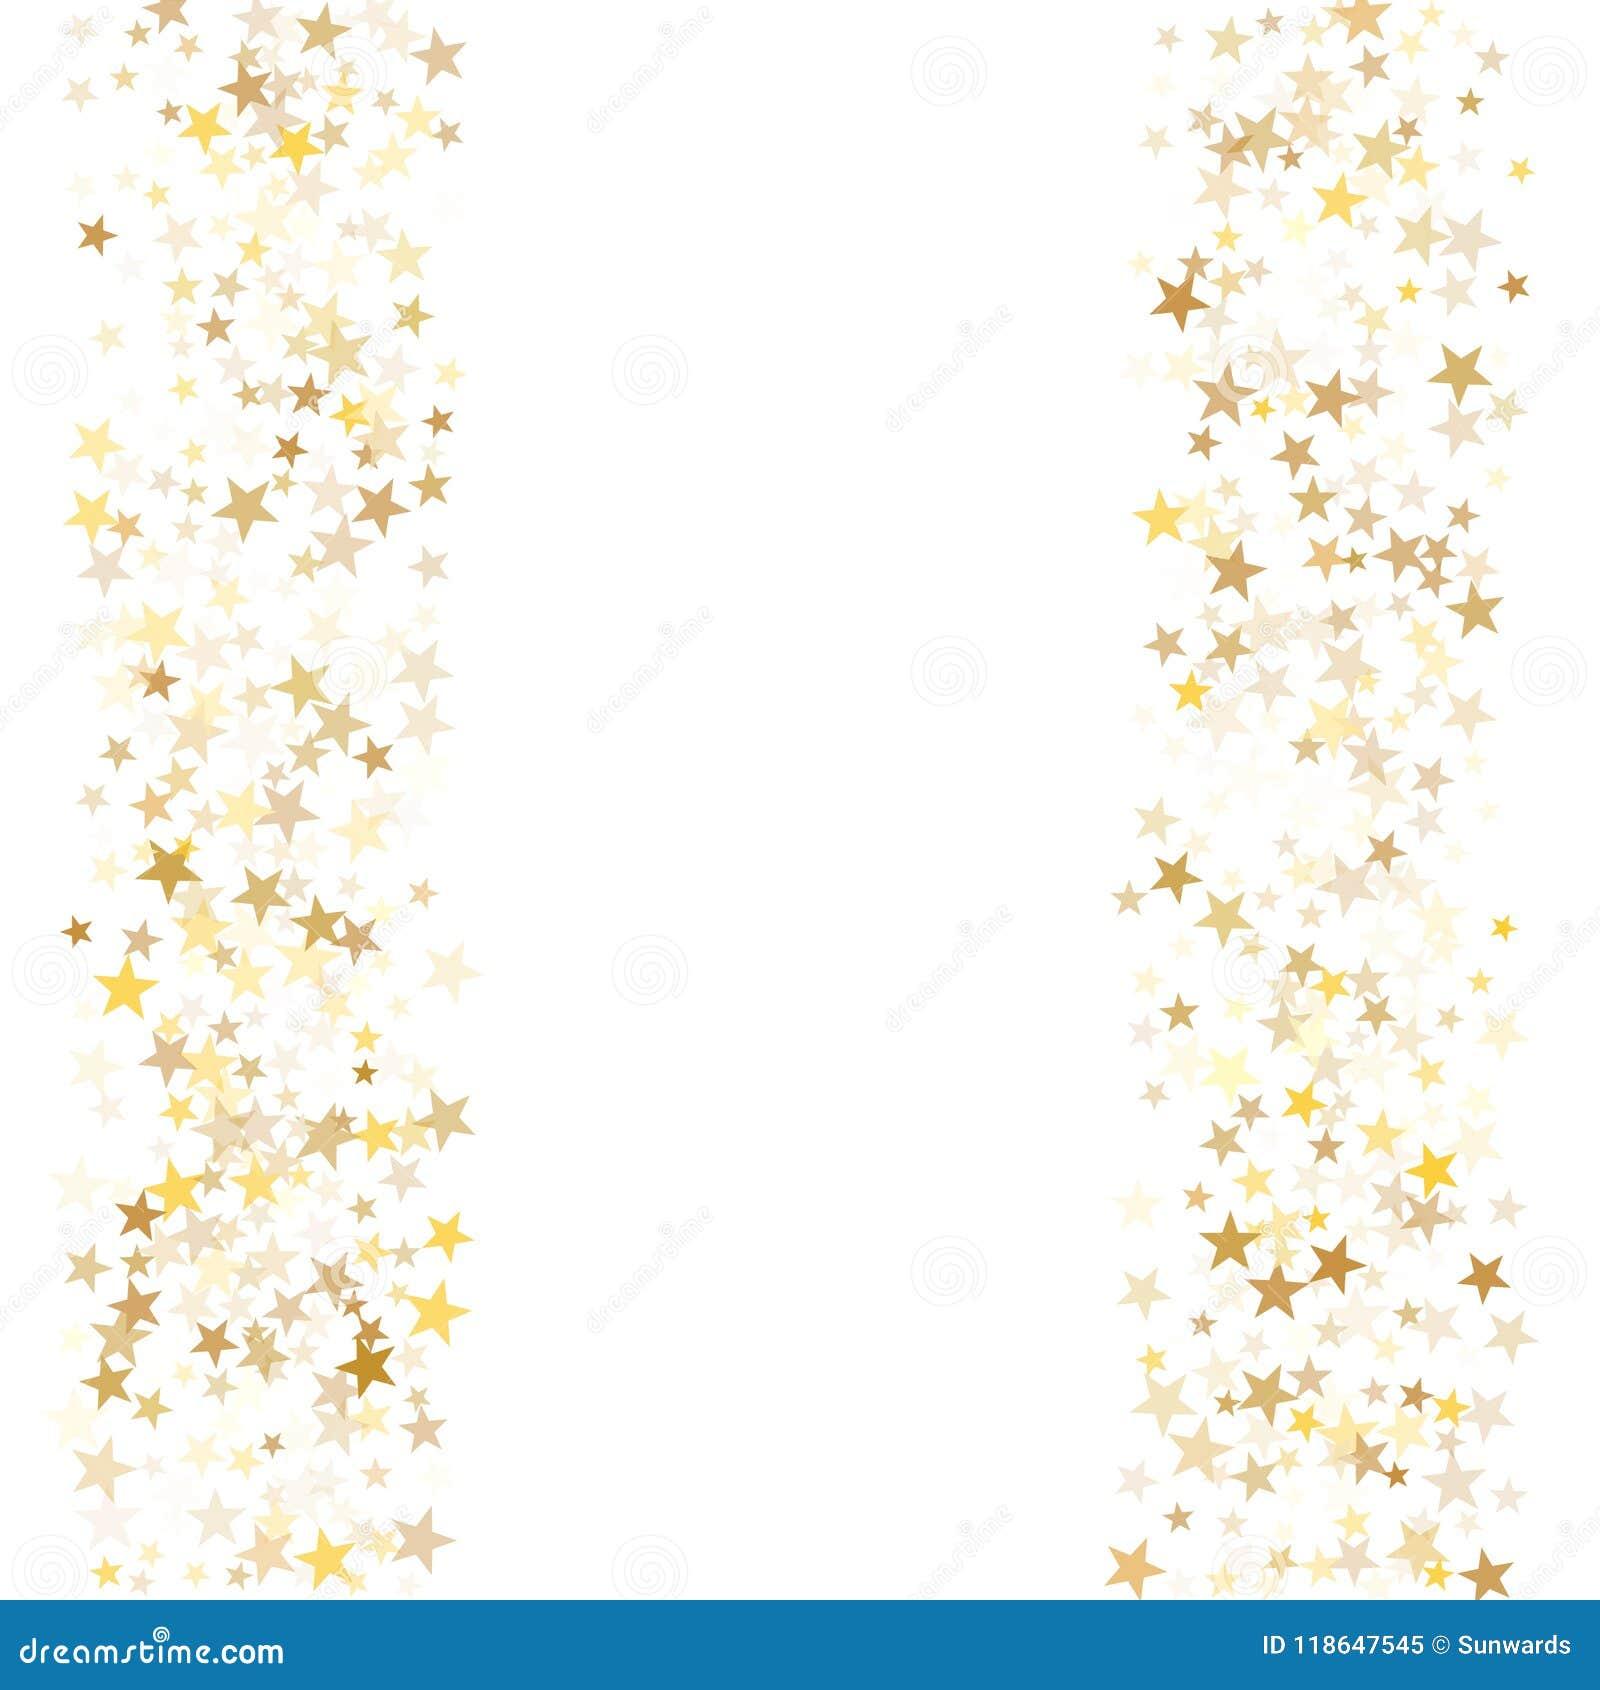 Gold Flying Stars Confetti Magic Holiday Frame Vector, Premium ...